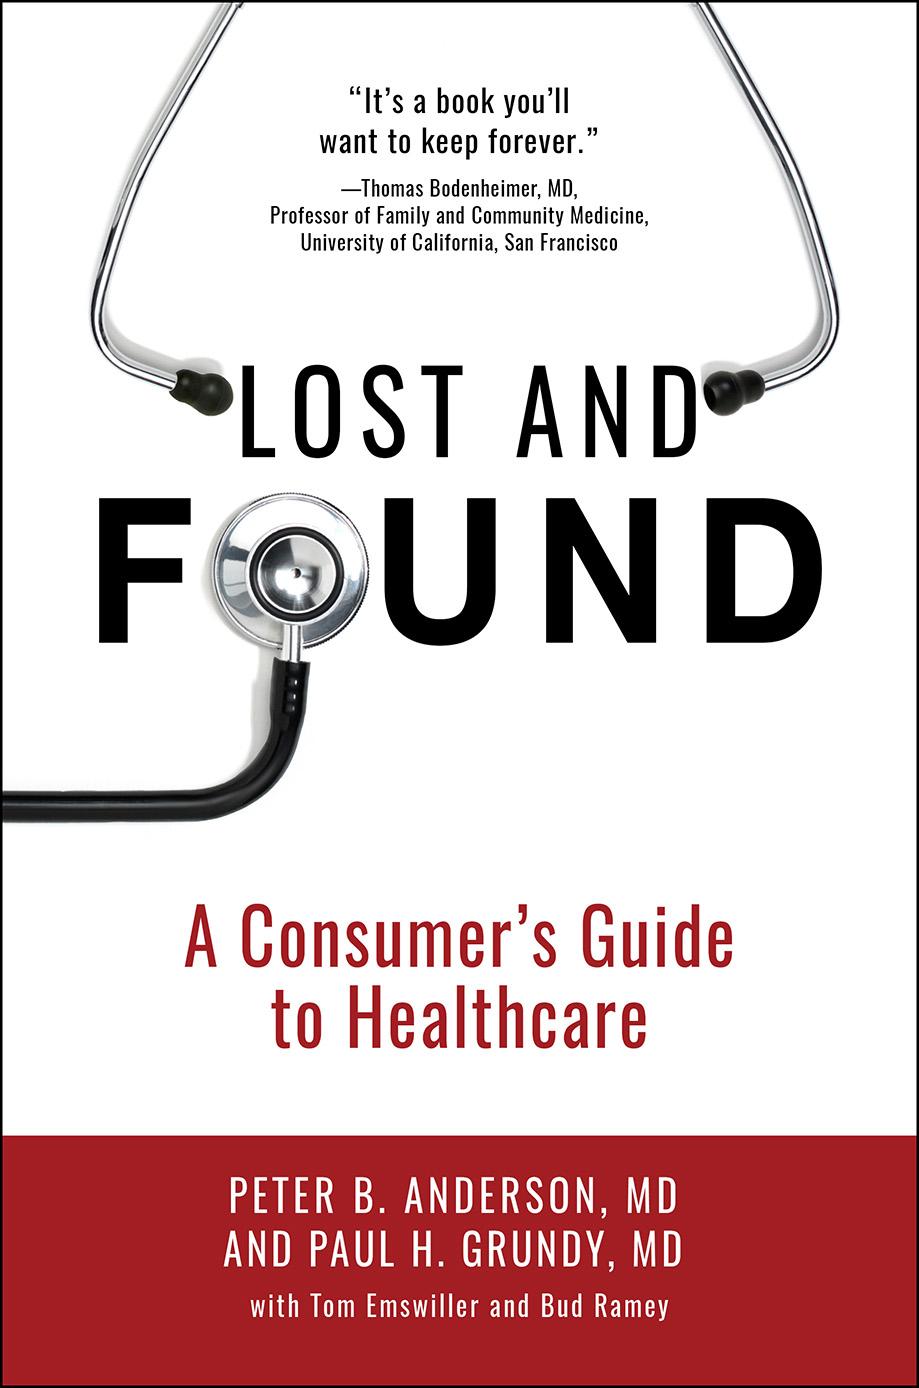 Lost & Found: A Consumer's Guide to Healthcare